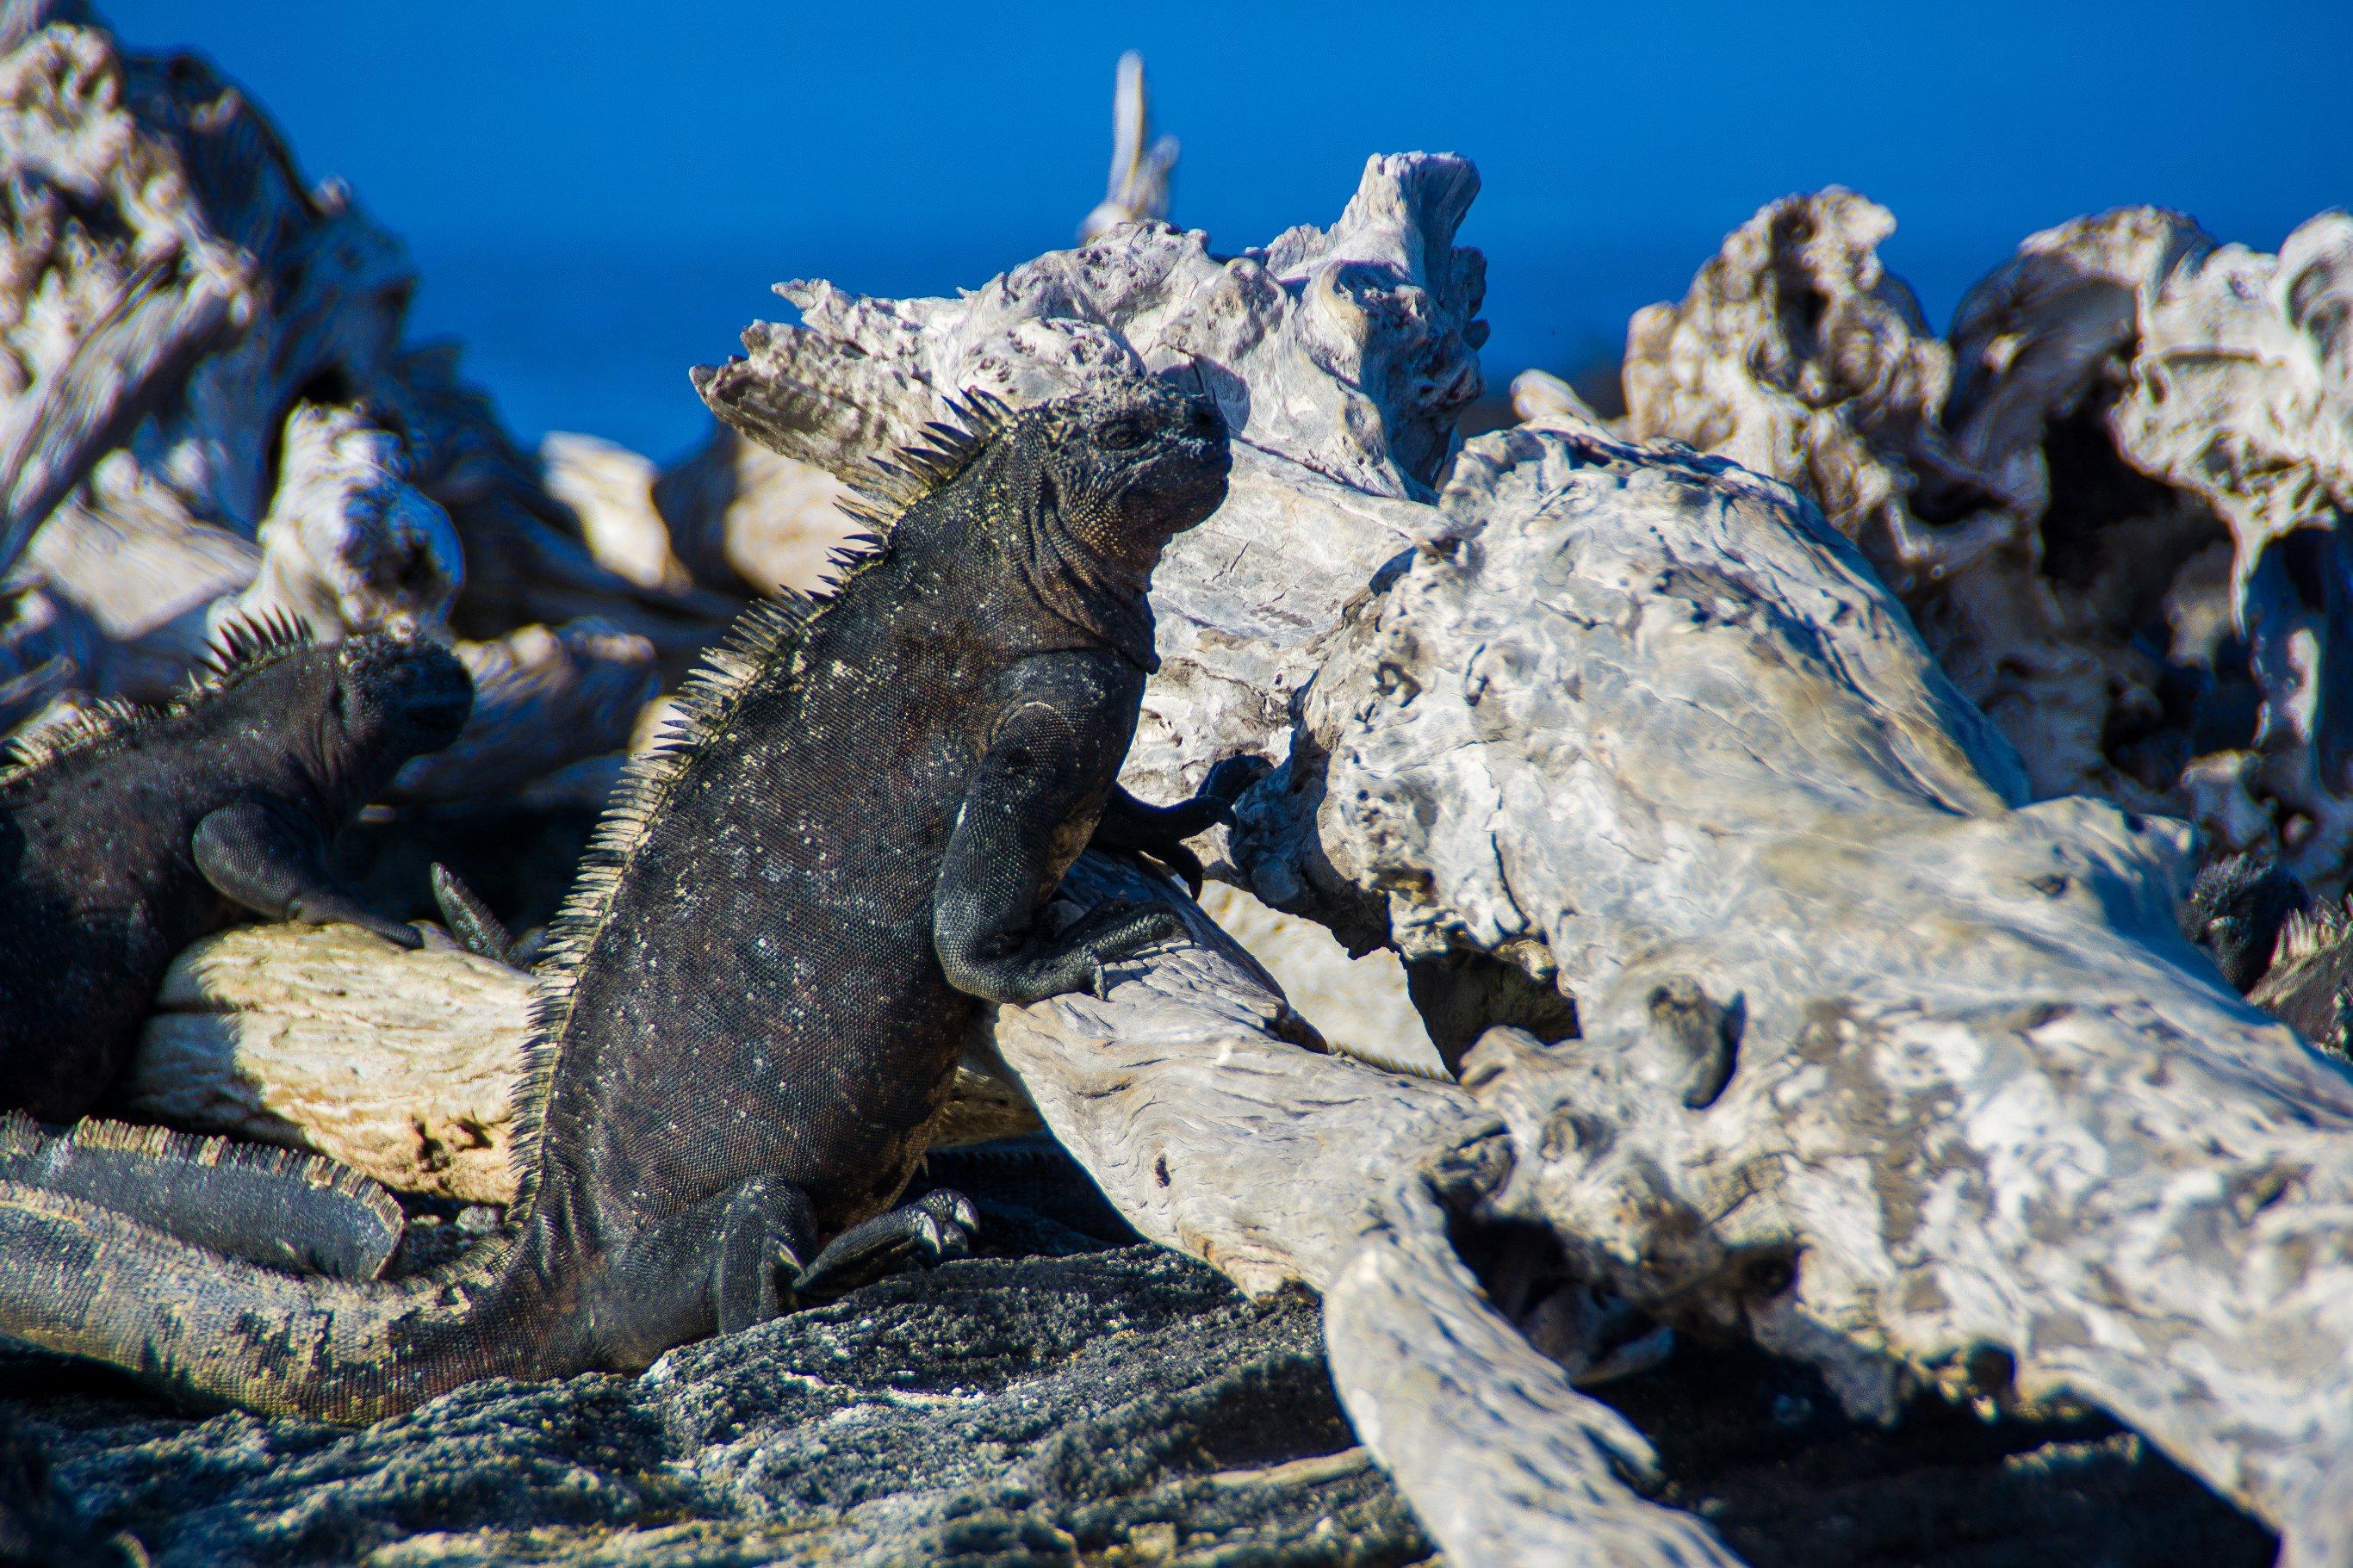 8-Day Galapagos Cruise Western Islands - Ecuador Itinerary